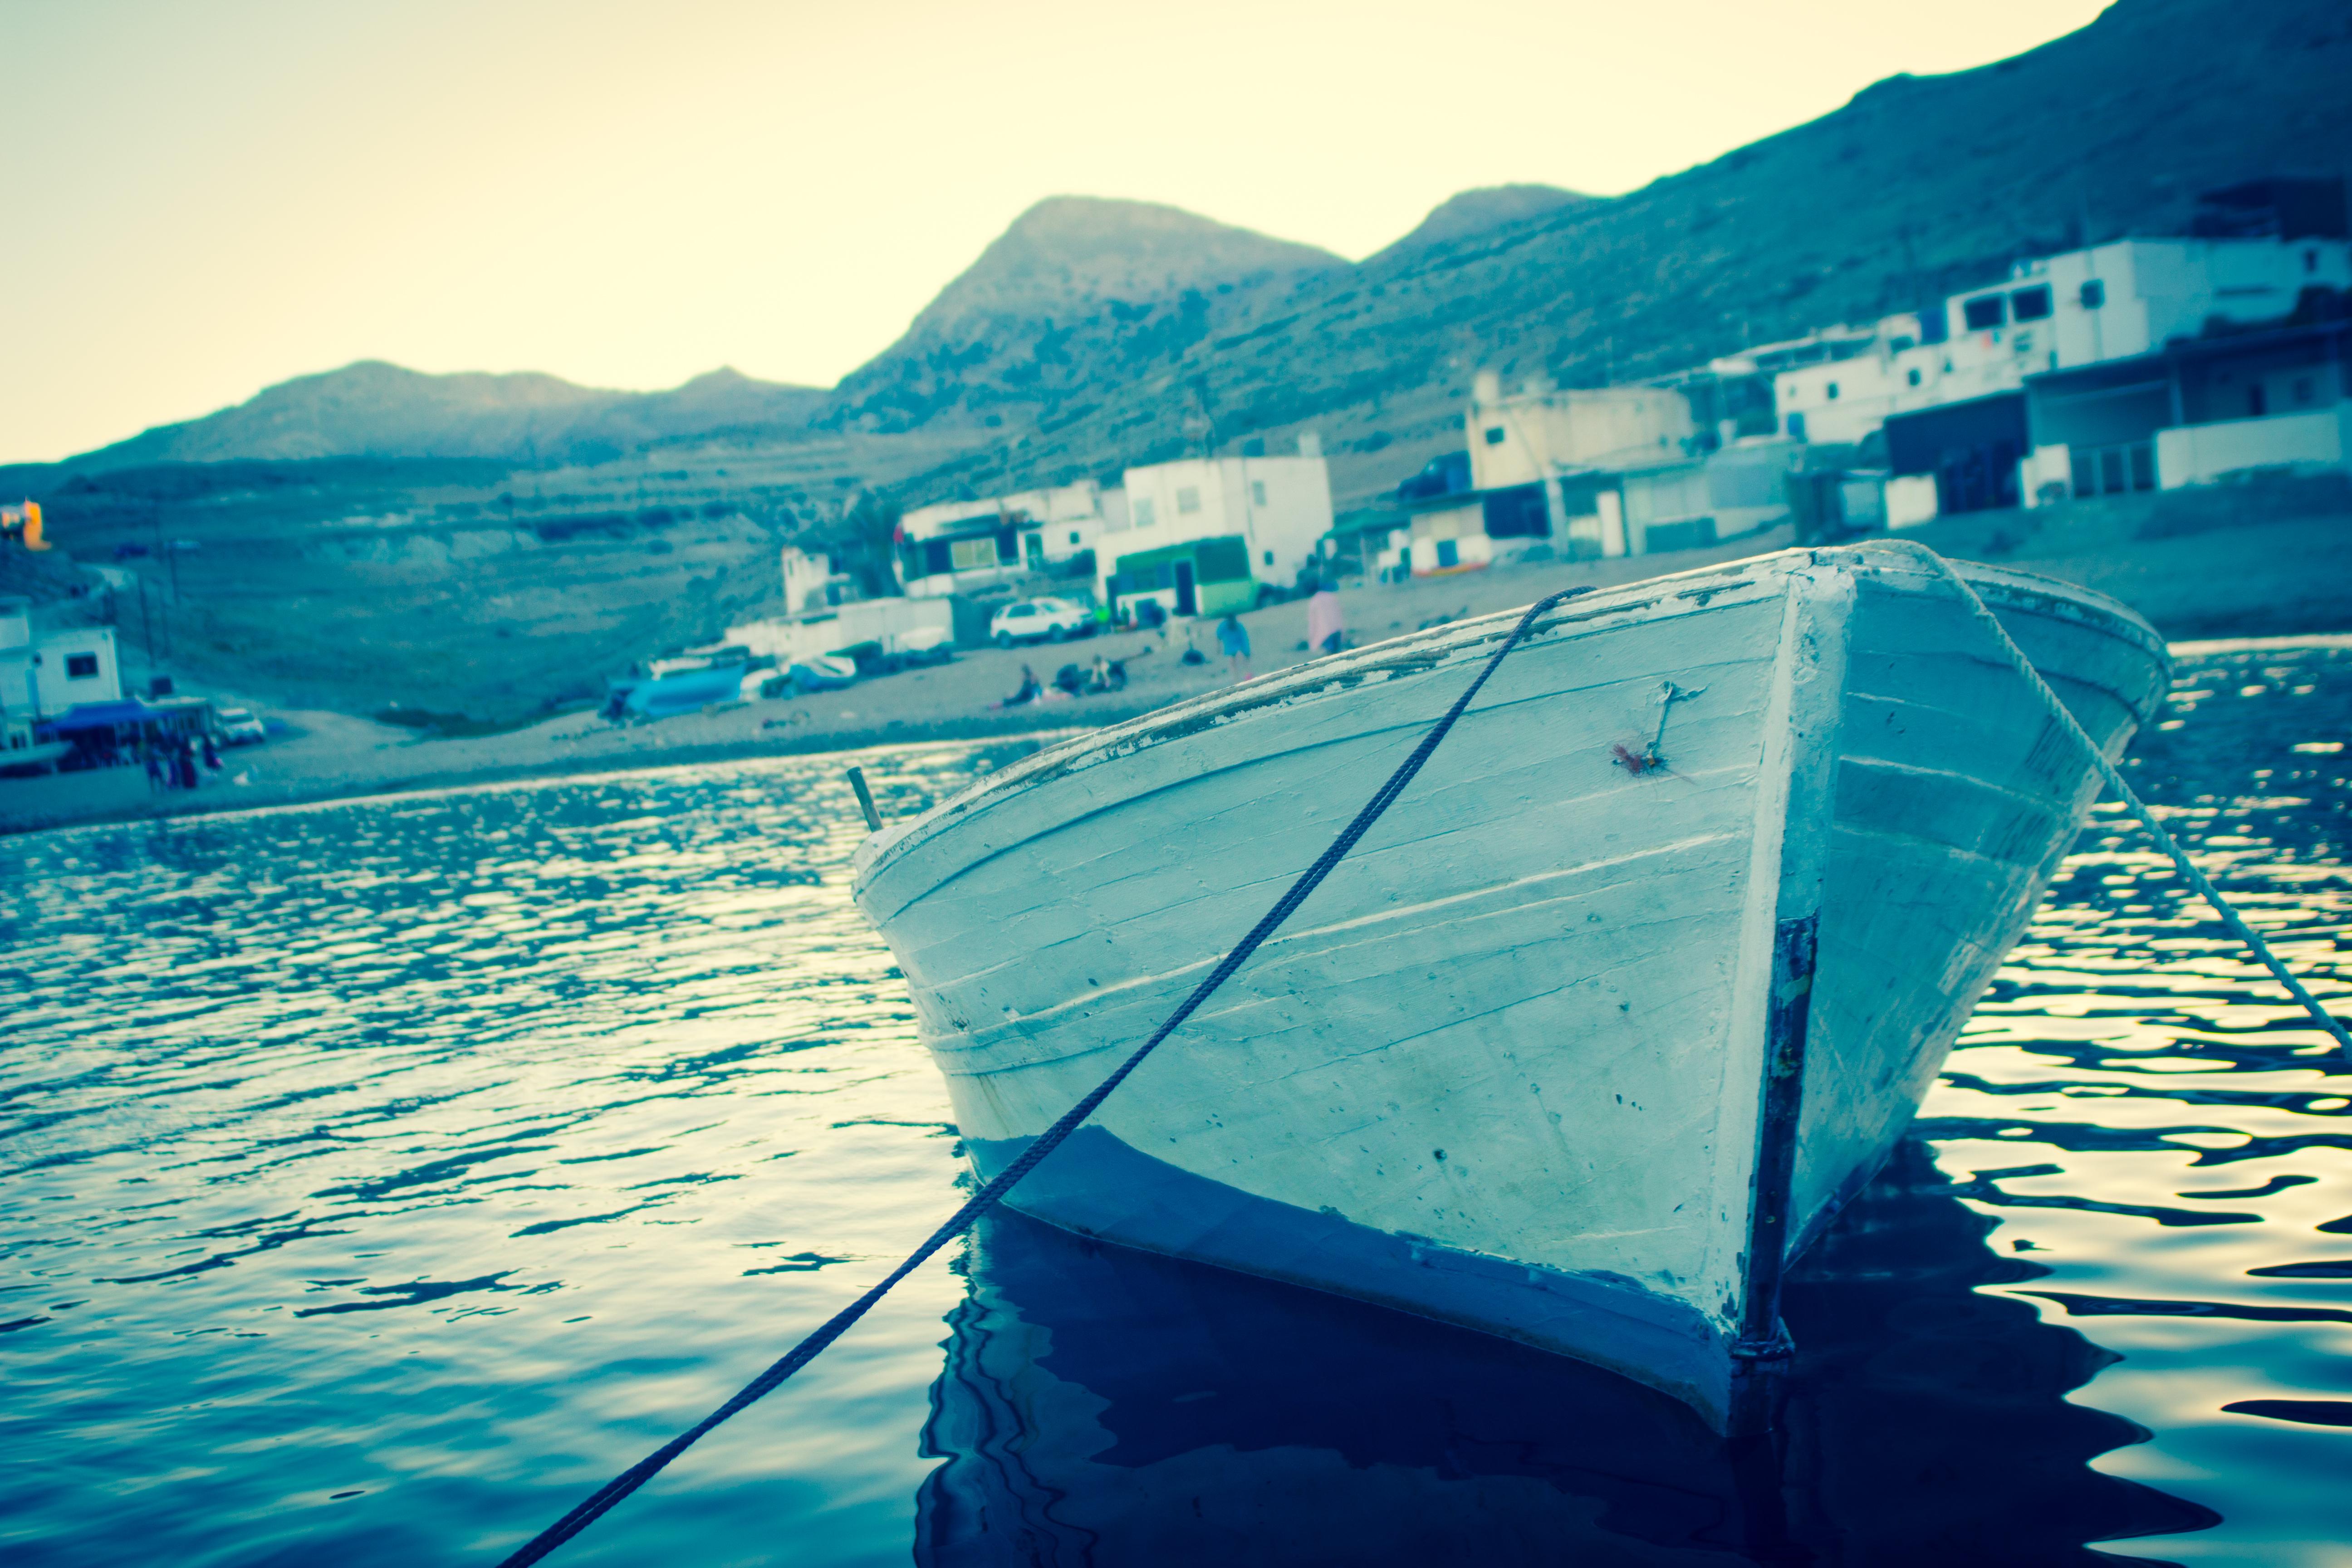 The boat south mediterranean-Maghrebis.jpg